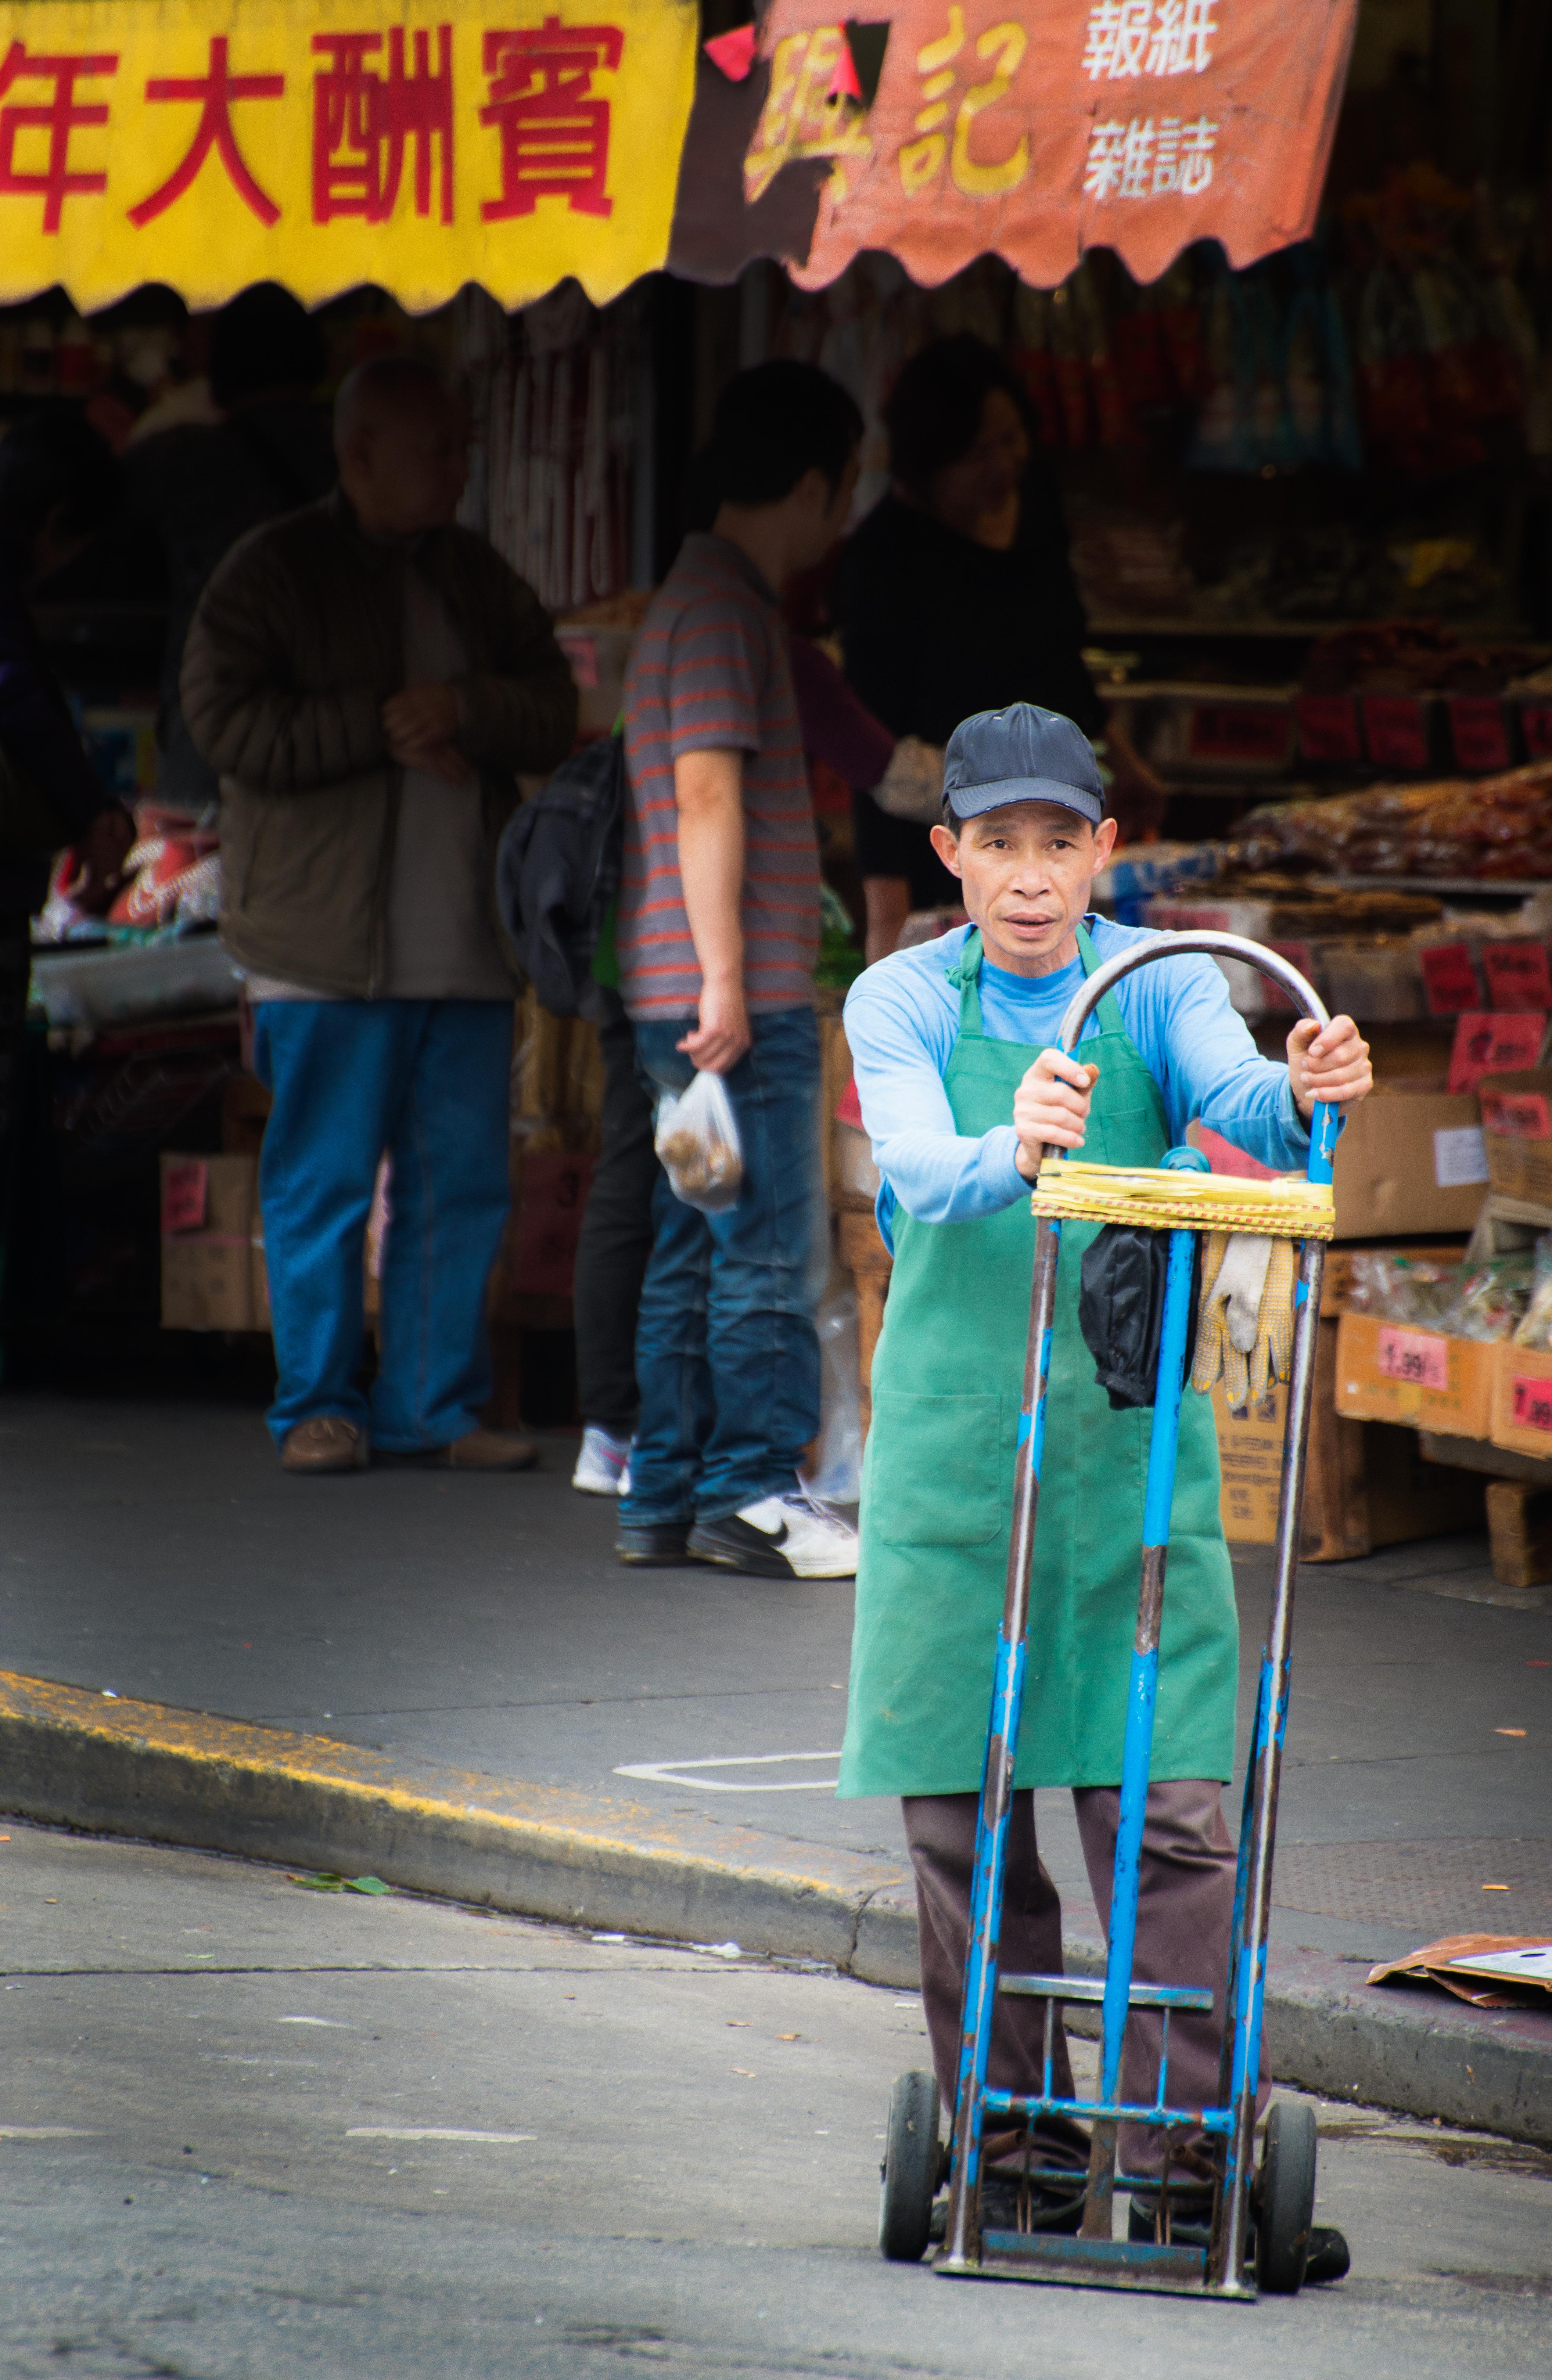 Worker Chinatown San Francisco